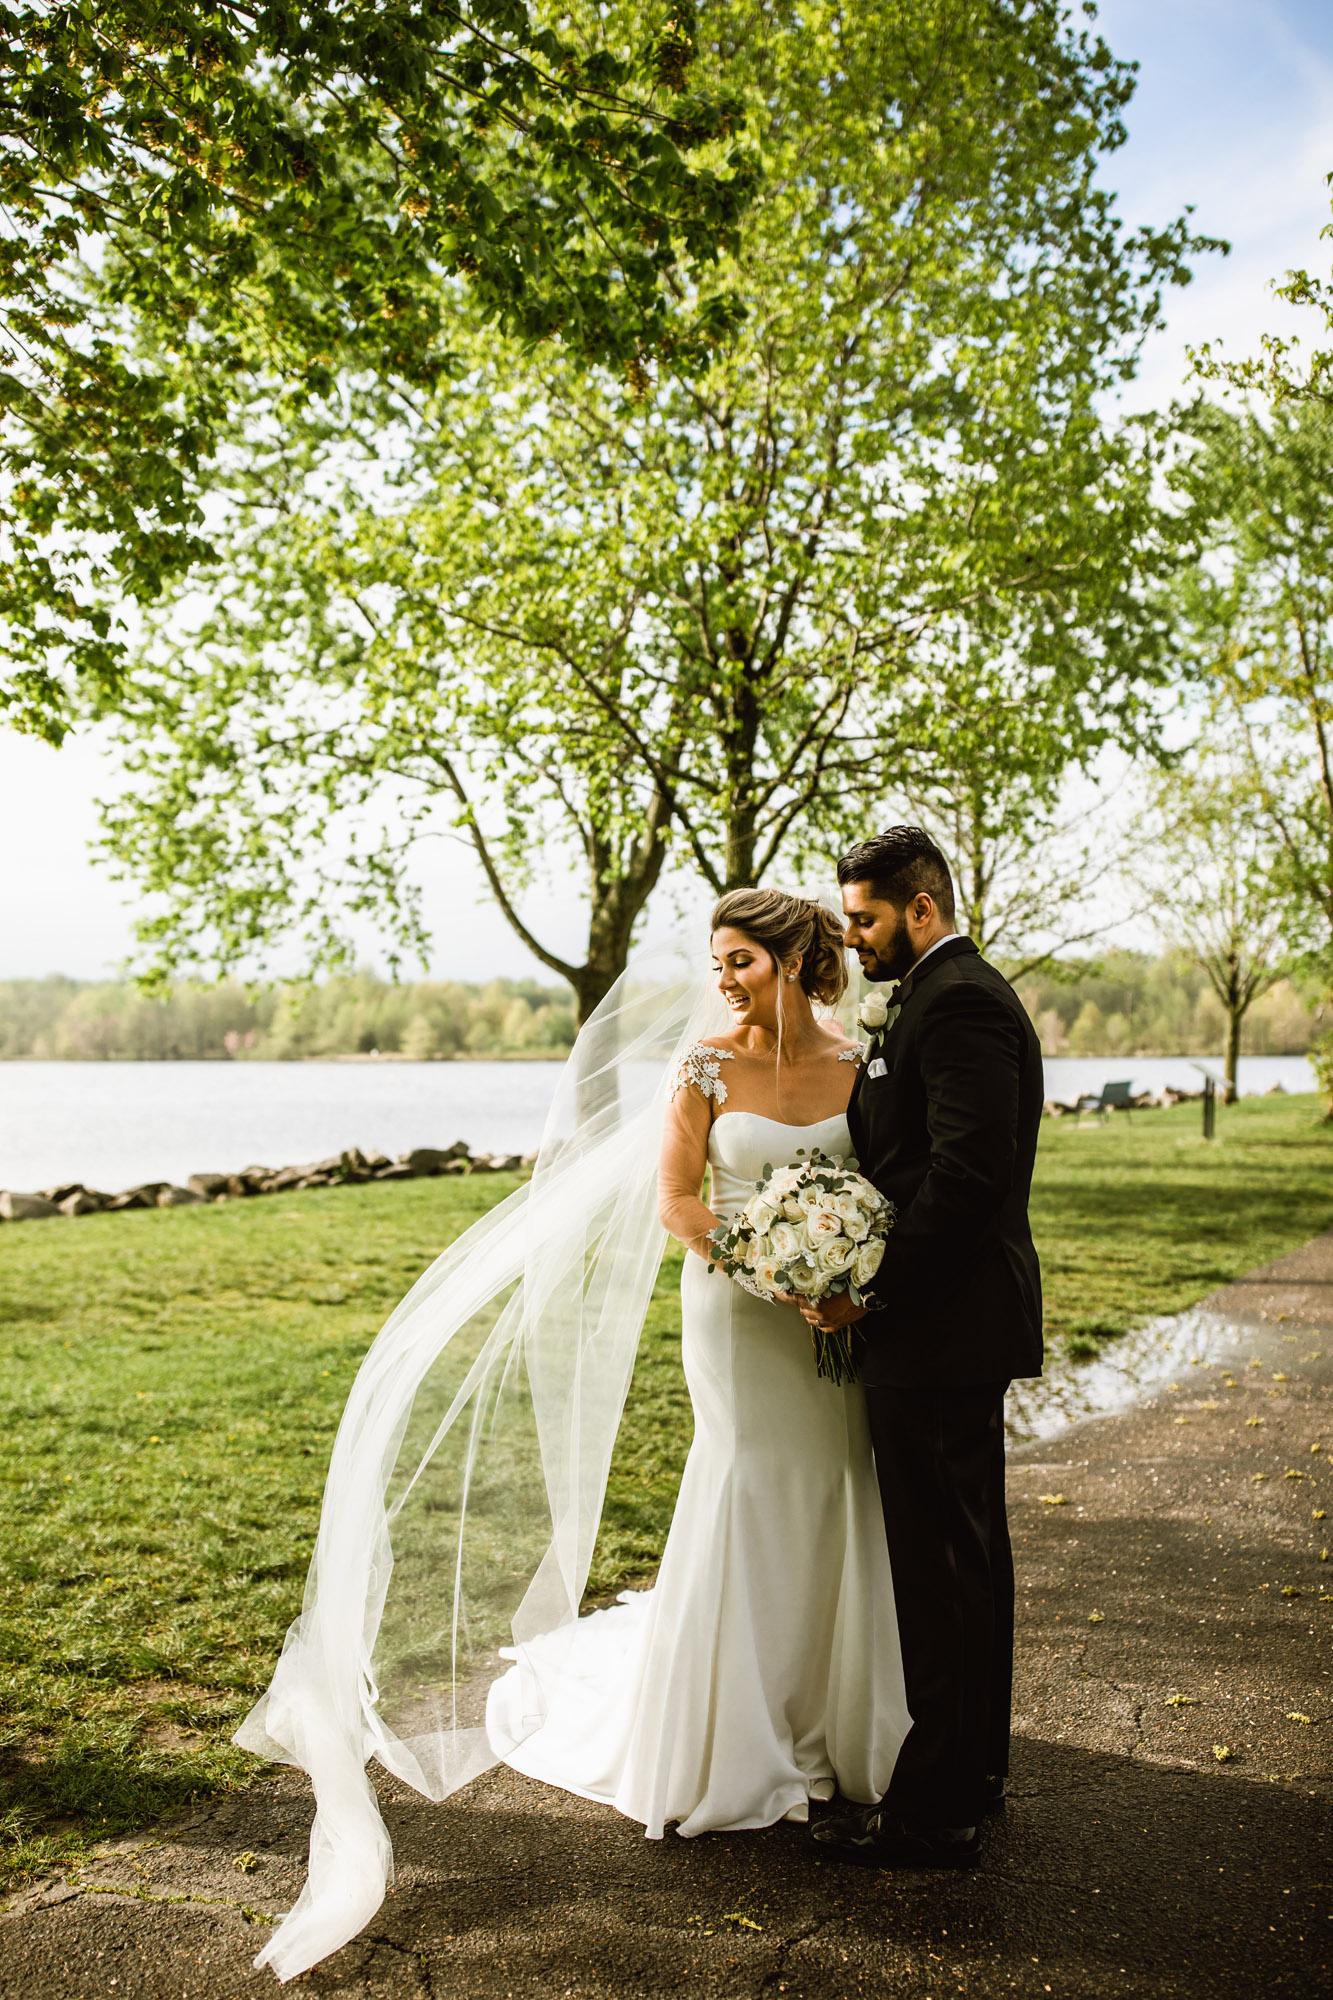 philadelphia-pa-pennsylvania-denver-colorado-wedding-photographer-boathouse-at-mercer-lake-new-jersey-kylewillisphoto-kyle-willis-photography